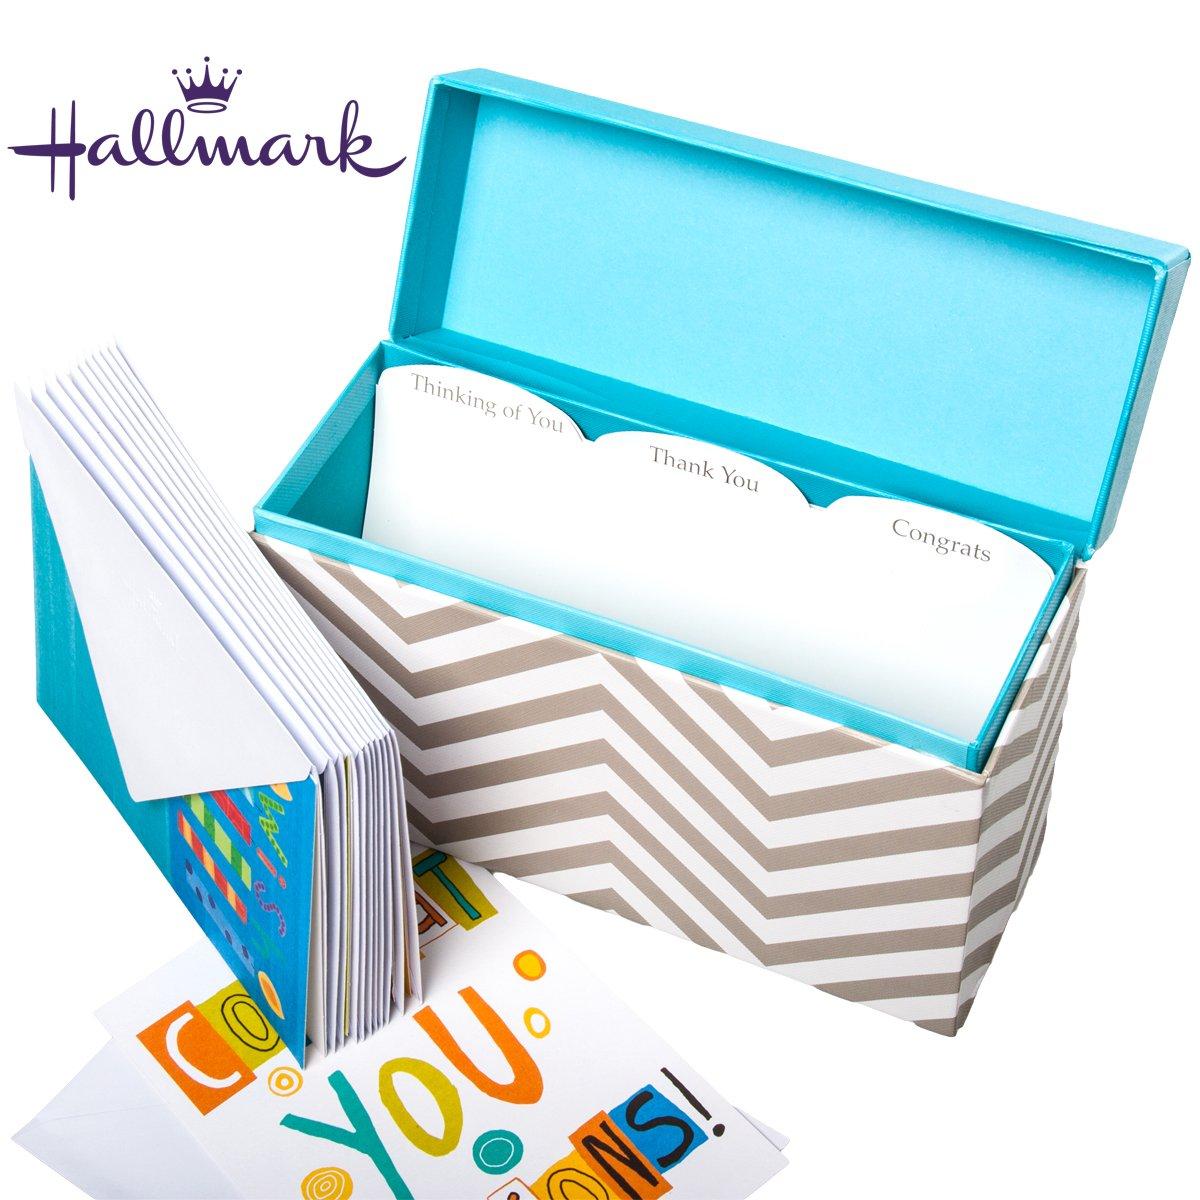 Amazon Hallmark Greeting Card Display Organizer That Includes